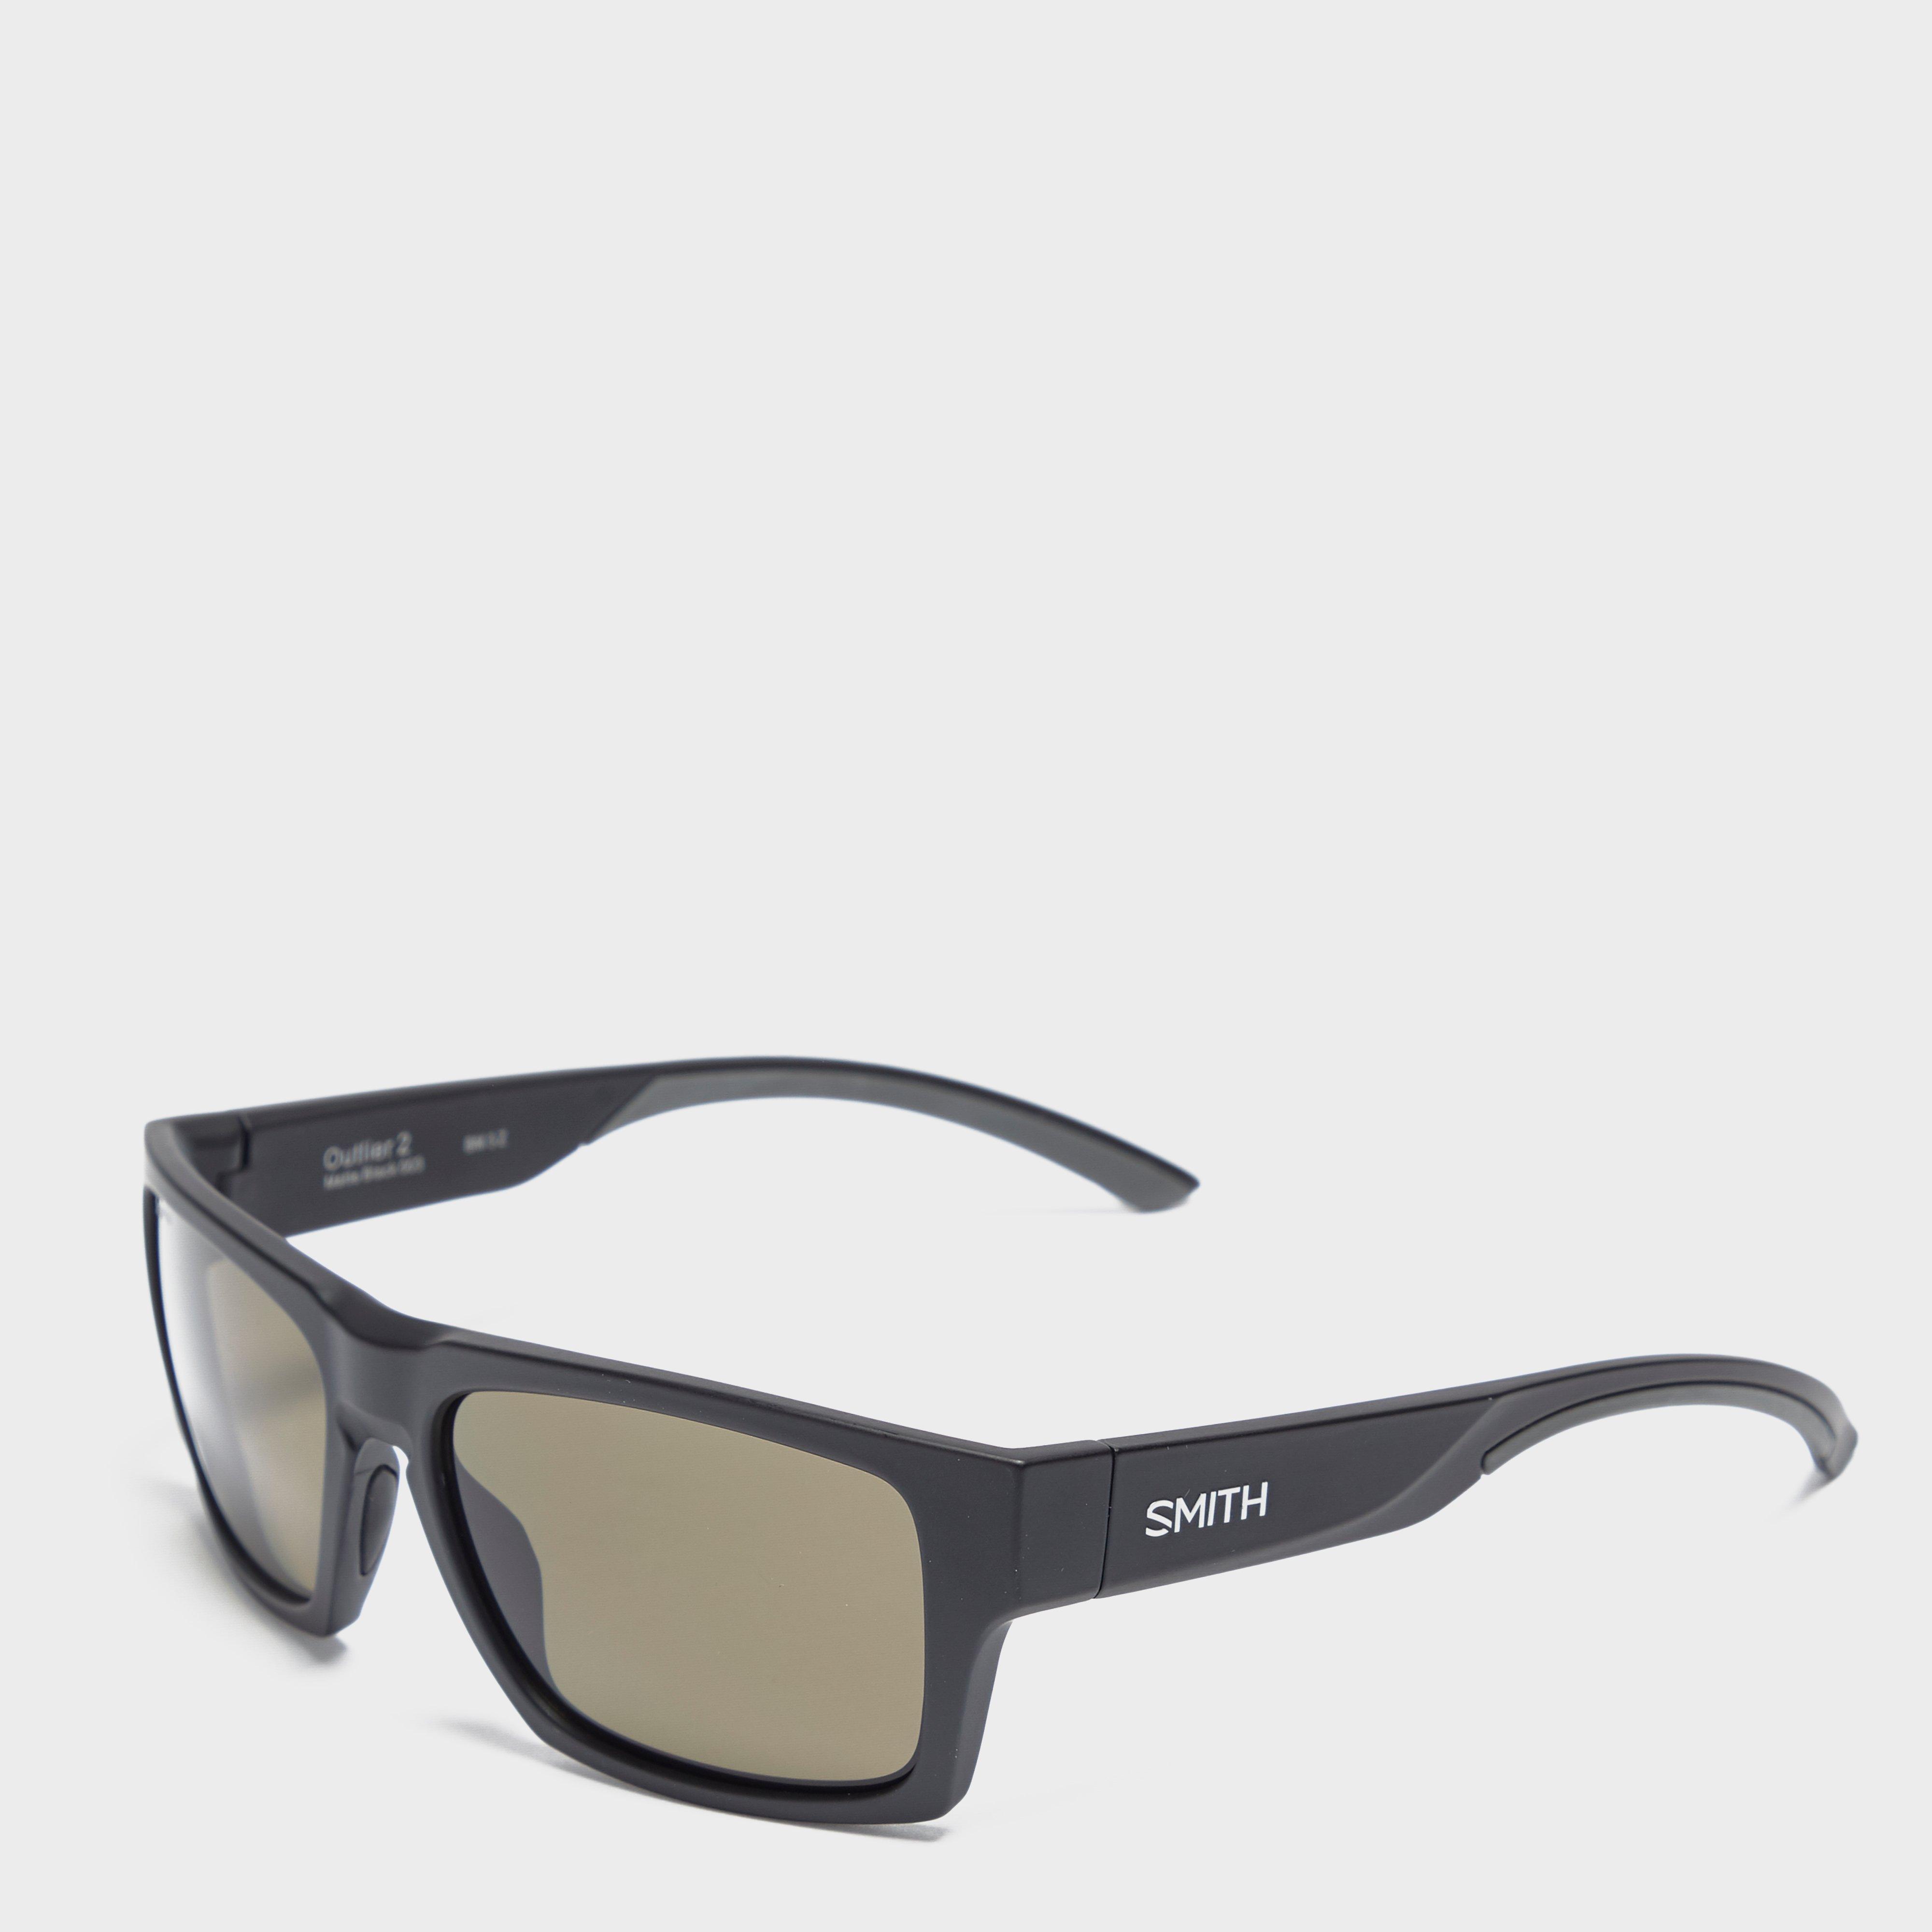 Smith Men's Outlier 2 Sunglasses, Black